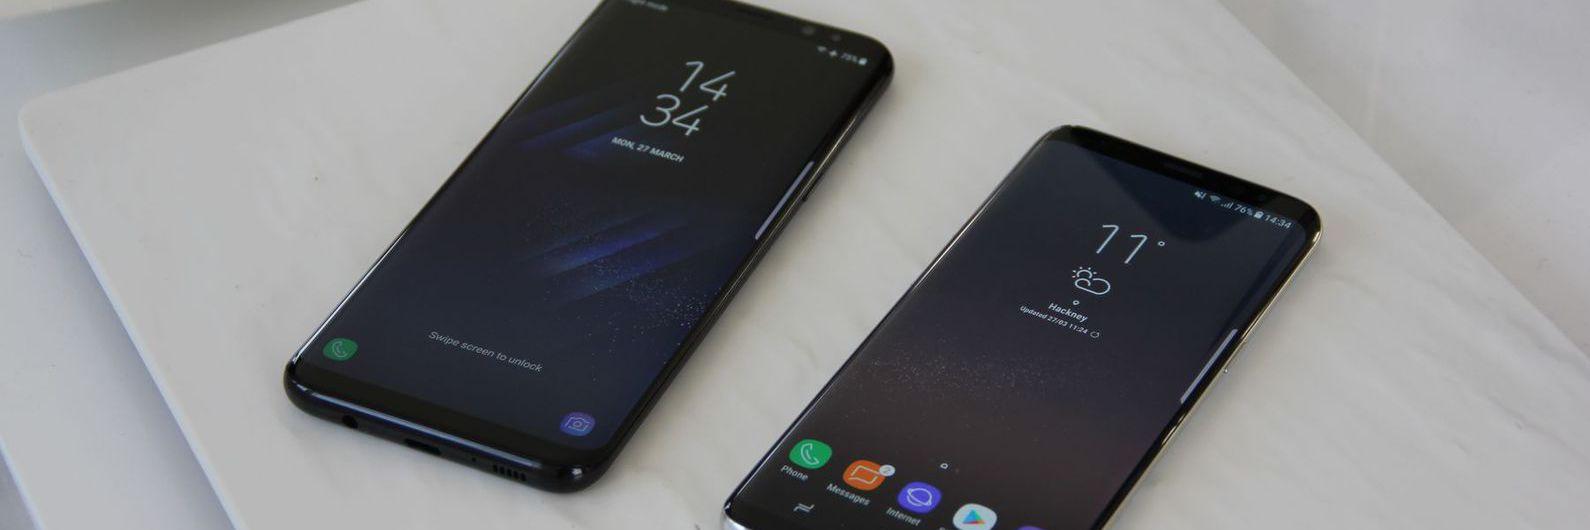 Portugal: preço mínimo do novo Galaxy S8 ultrapassa os 800 euros